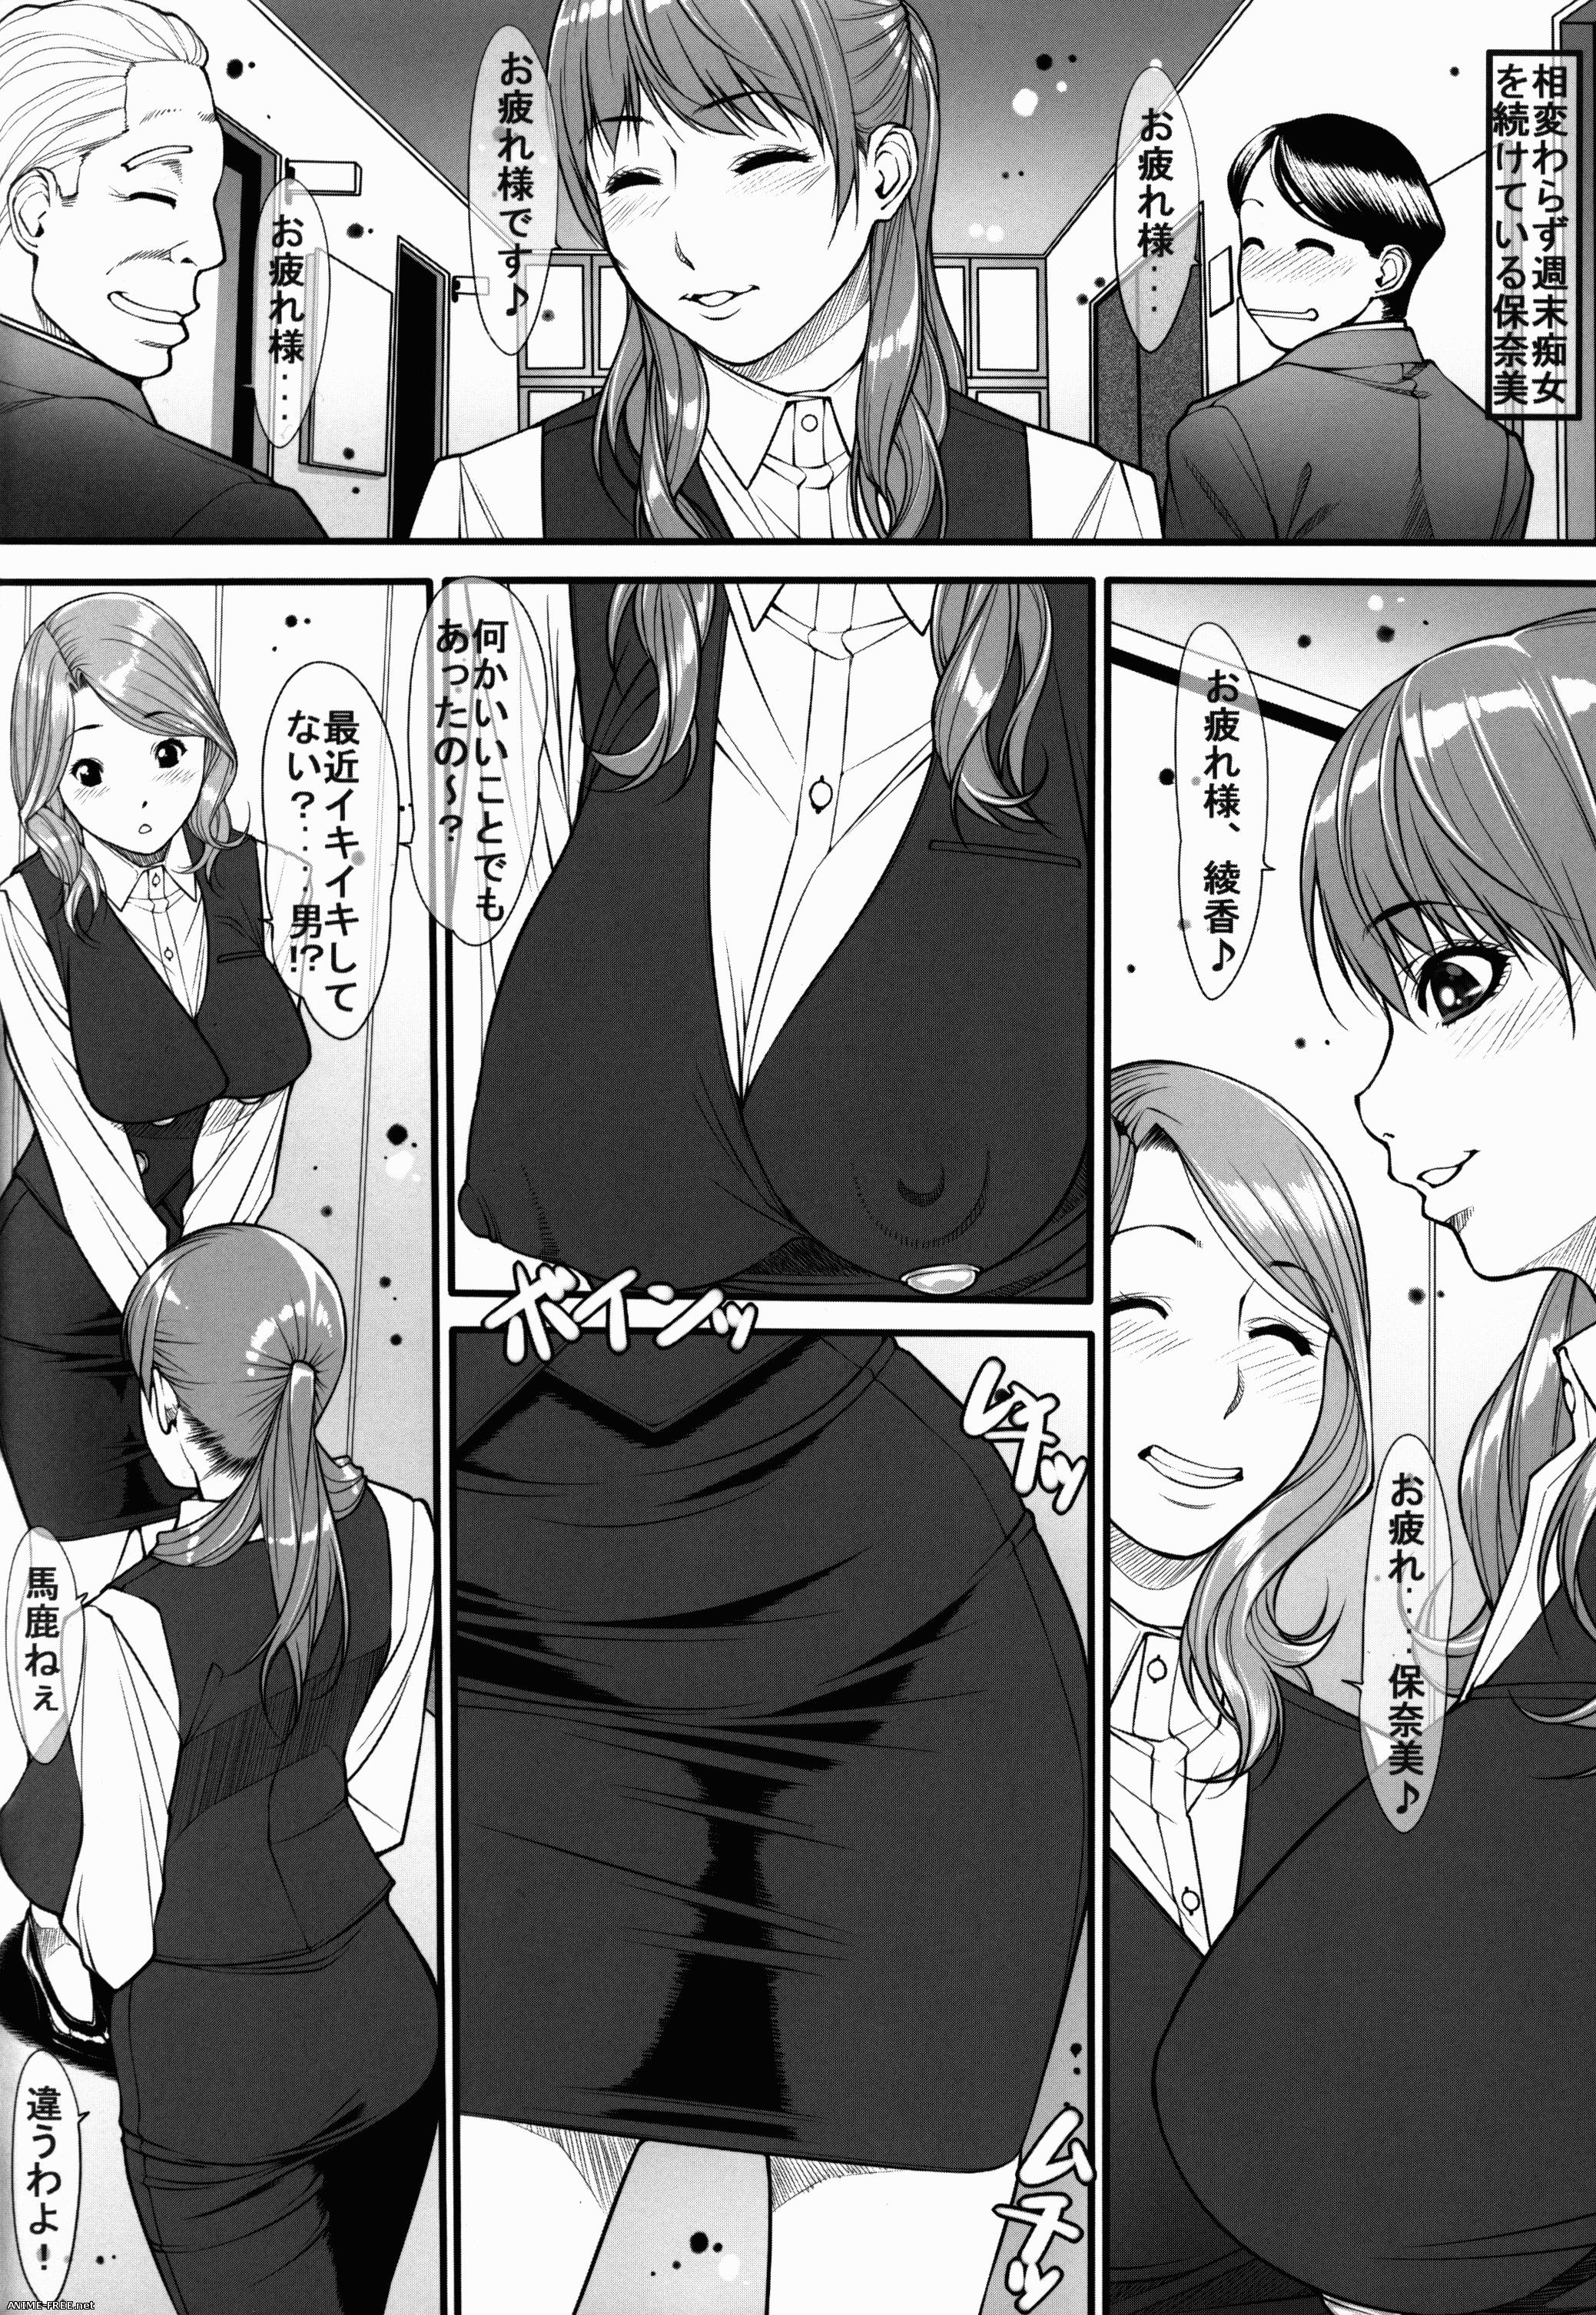 Kuroishi Ringo / Kudamono Monogatari - Манга коллекция [Ptcen] [JAP,ENG] Manga Hentai